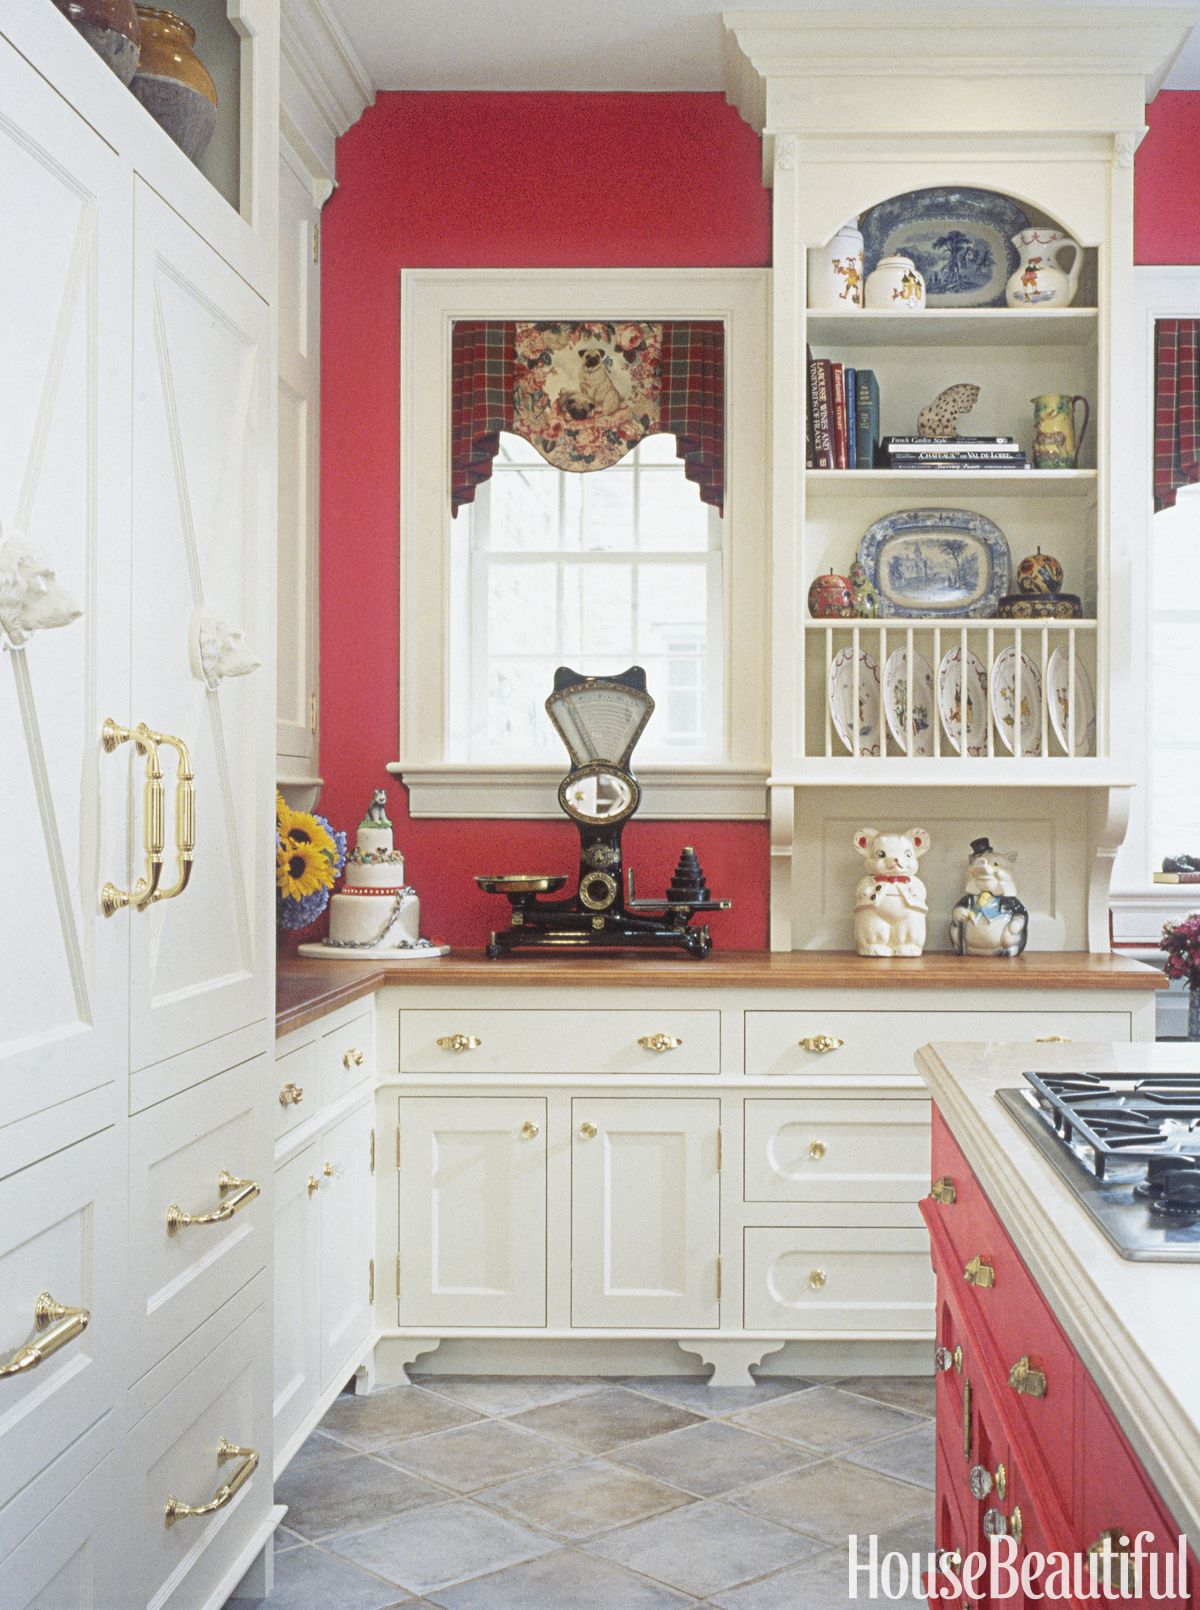 25+ Dreamy Paint Colors for Your Kitchen   Neutral kitchen designs ...